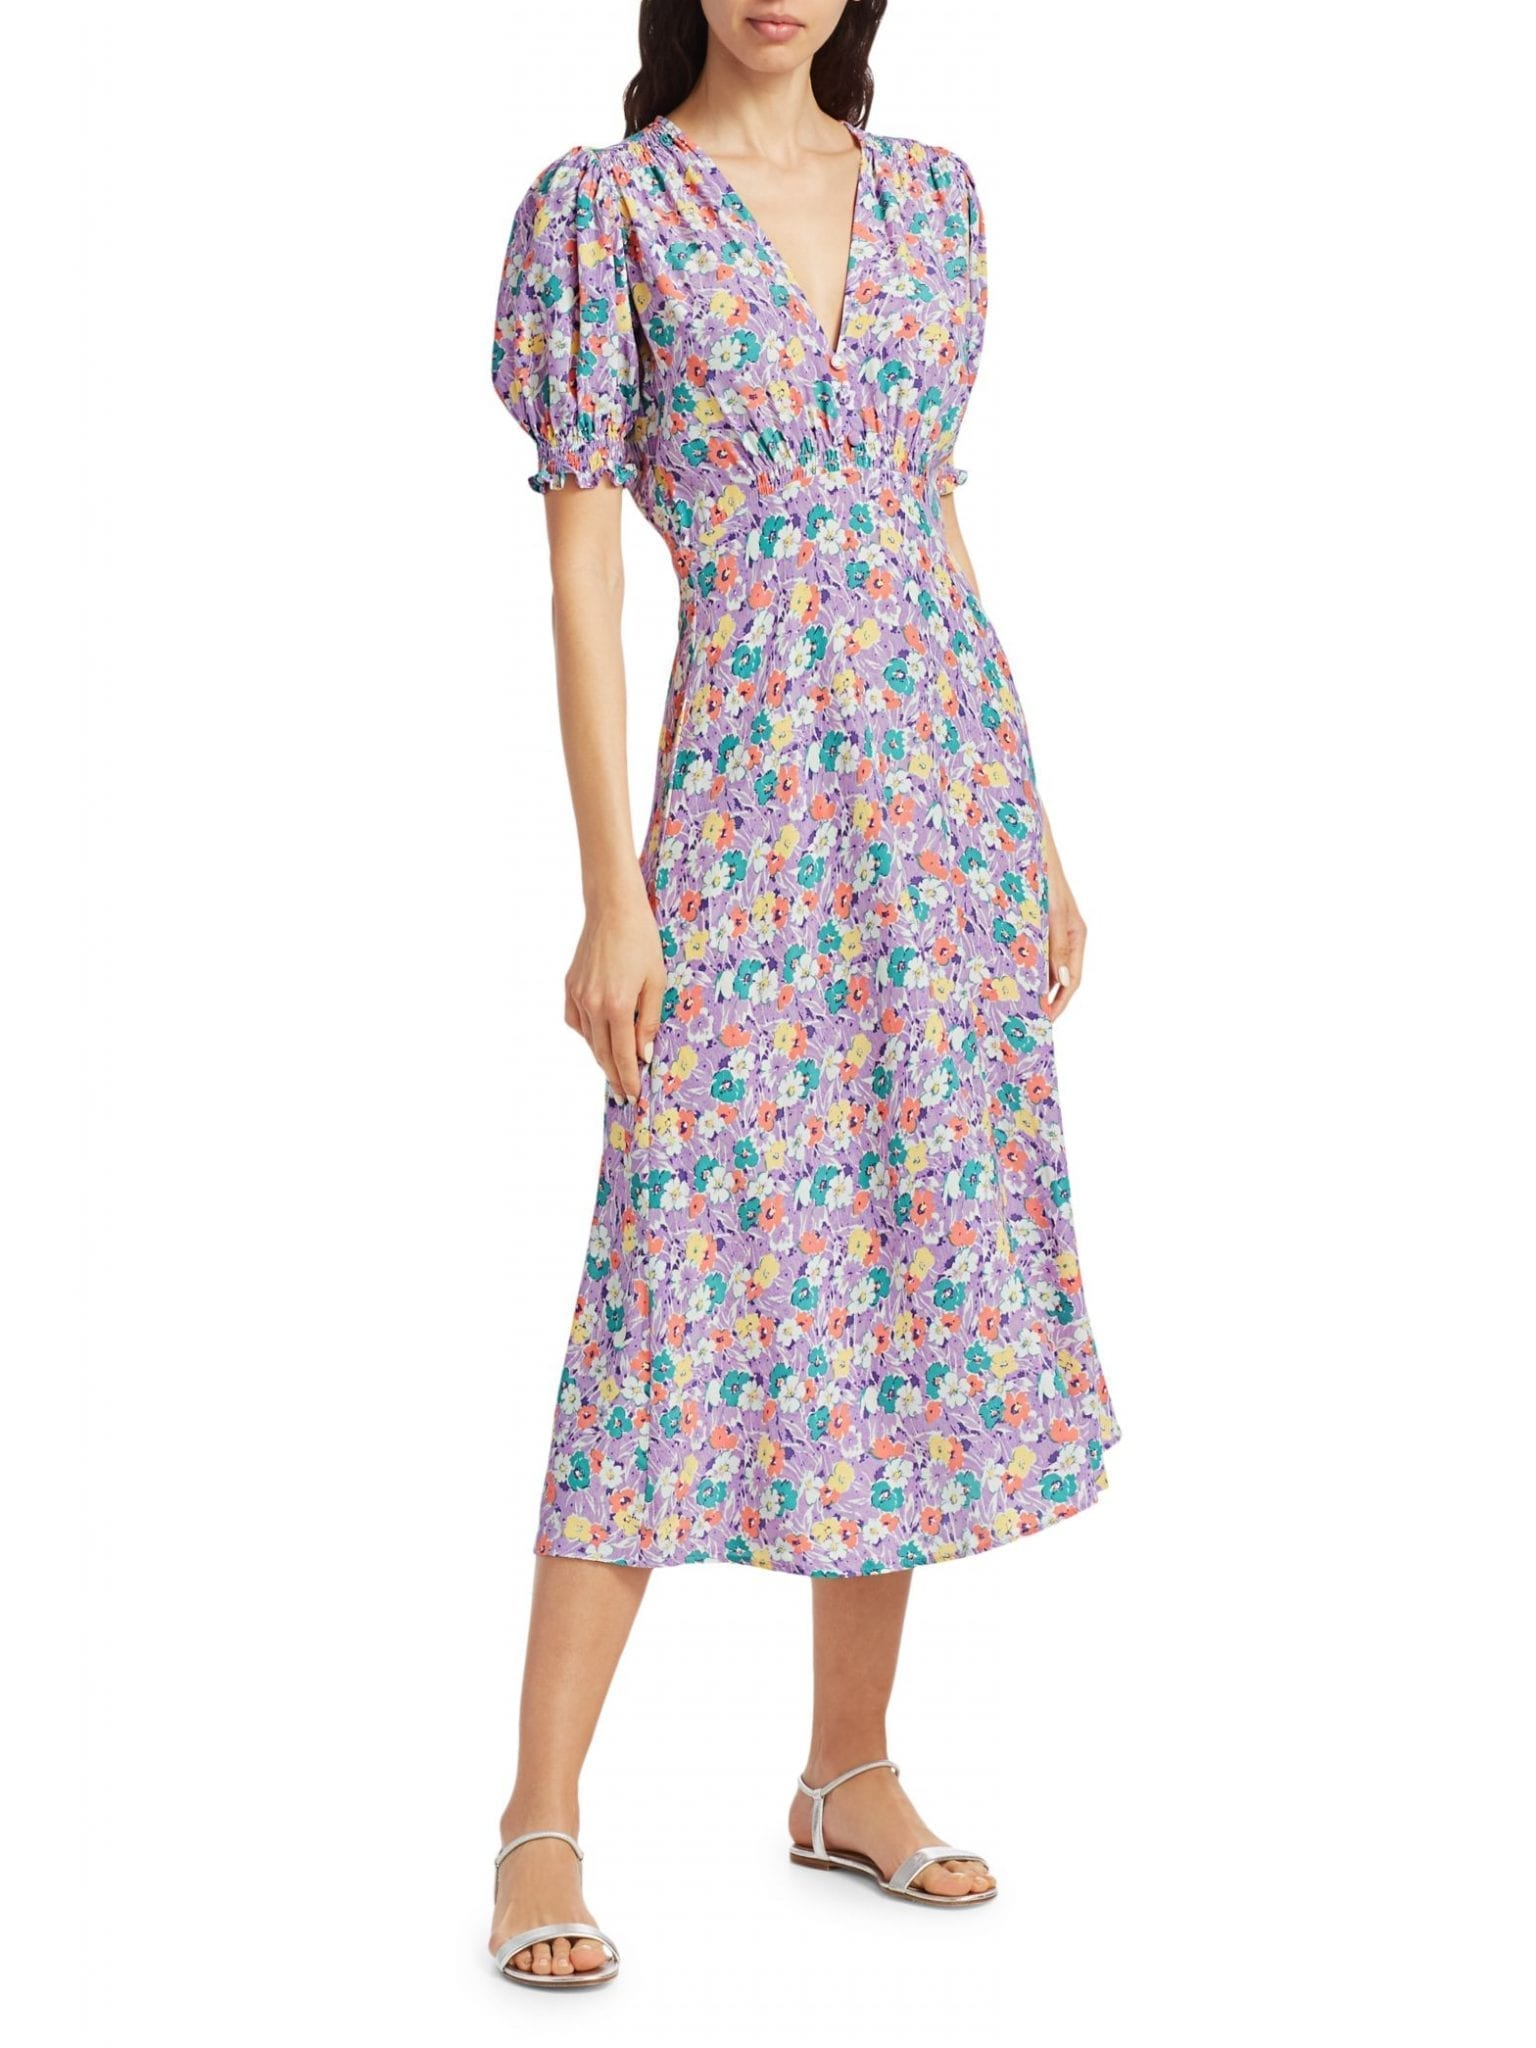 FAITHFULL THE BRAND Marie-Louise Puff-Sleeve Floral Midi Dress